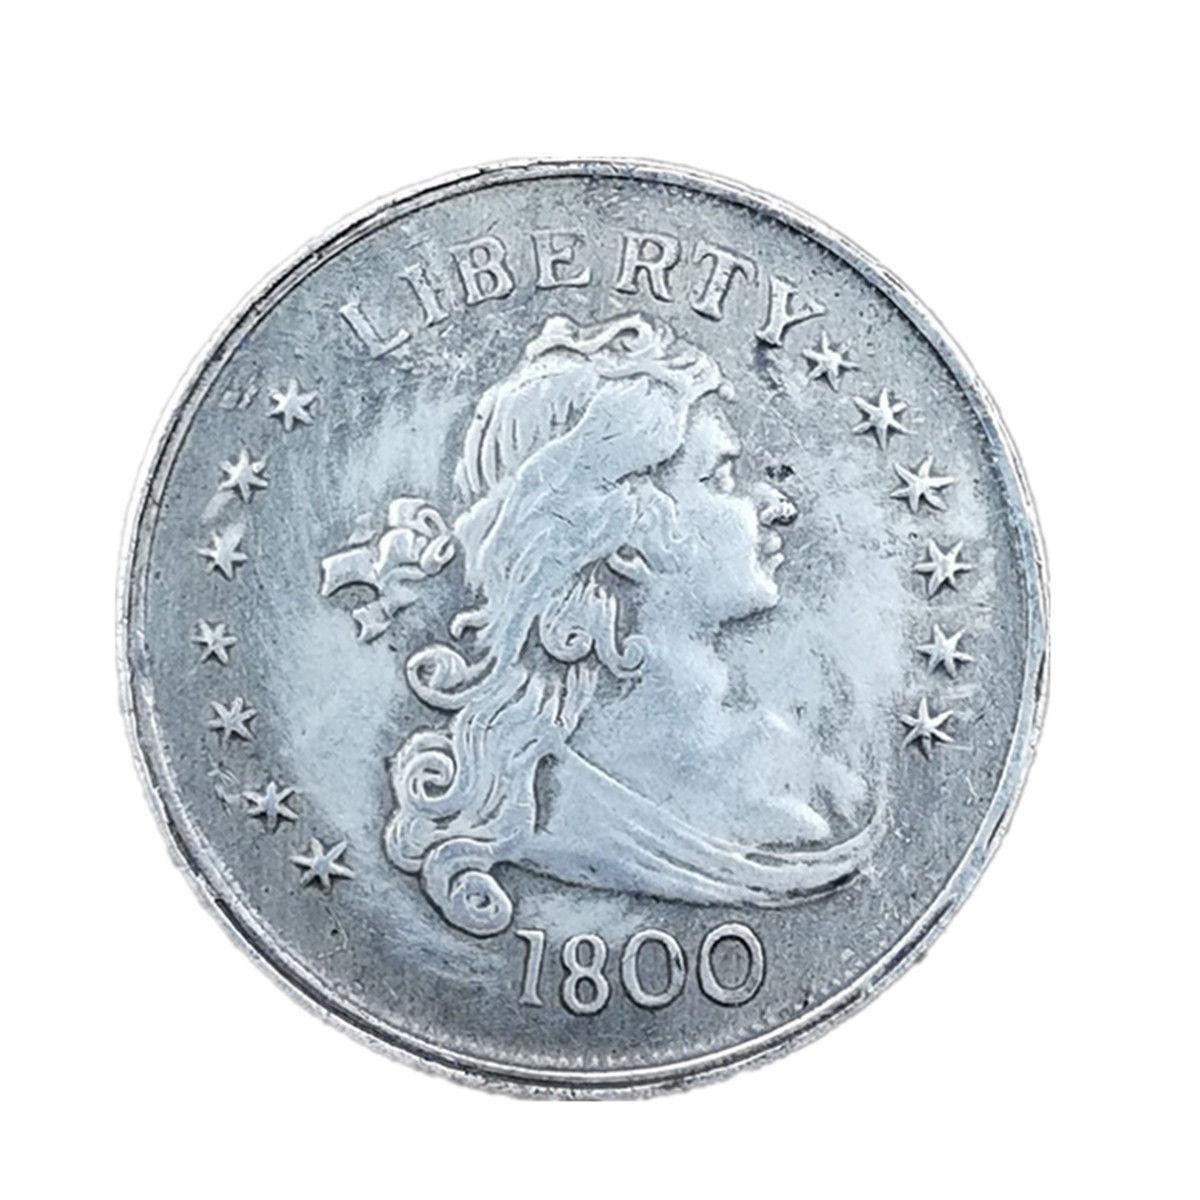 Großhandel 1800 Liberty American Eagle Coins Münzen Der Vereinigten